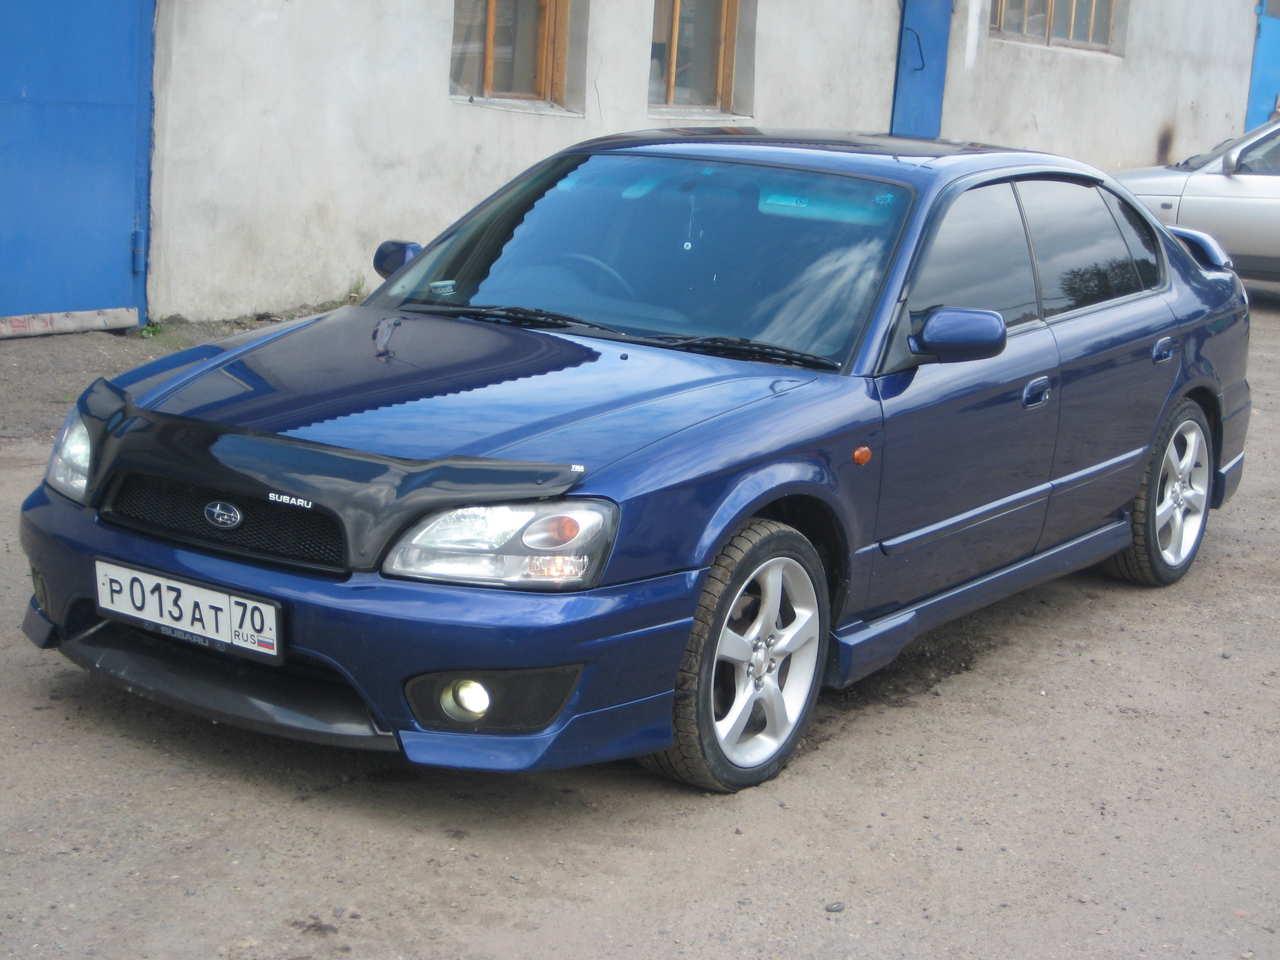 Engine Burning Oil >> 2002 Subaru LEGACY B4 specs, Engine size 2000cm3, Fuel type Gasoline, Transmission Gearbox Automatic